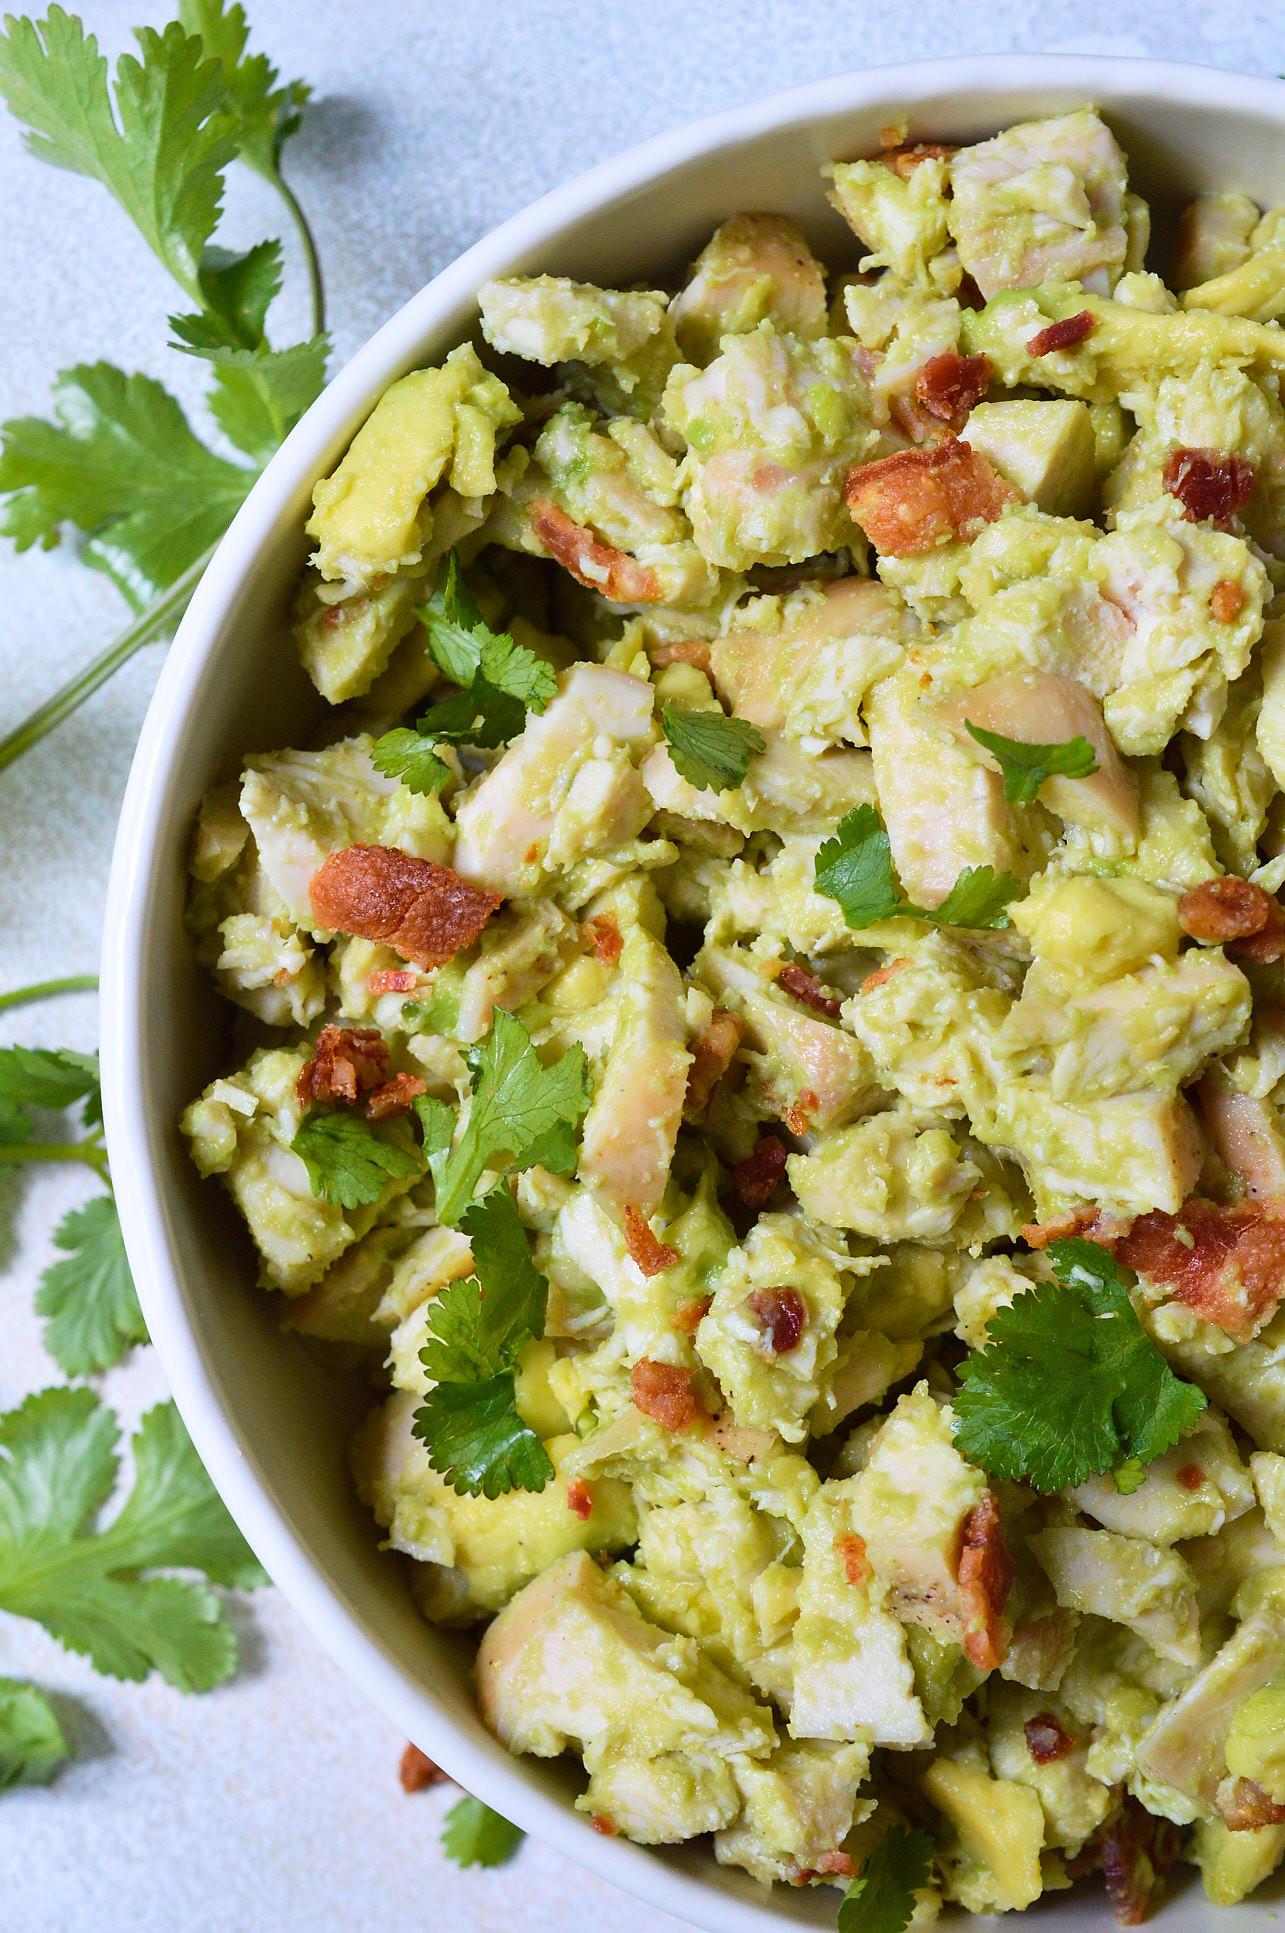 Healthy Chicken And Avocado Recipes  Bacon Avocado Chicken Salad Whole30 Recipe WonkyWonderful